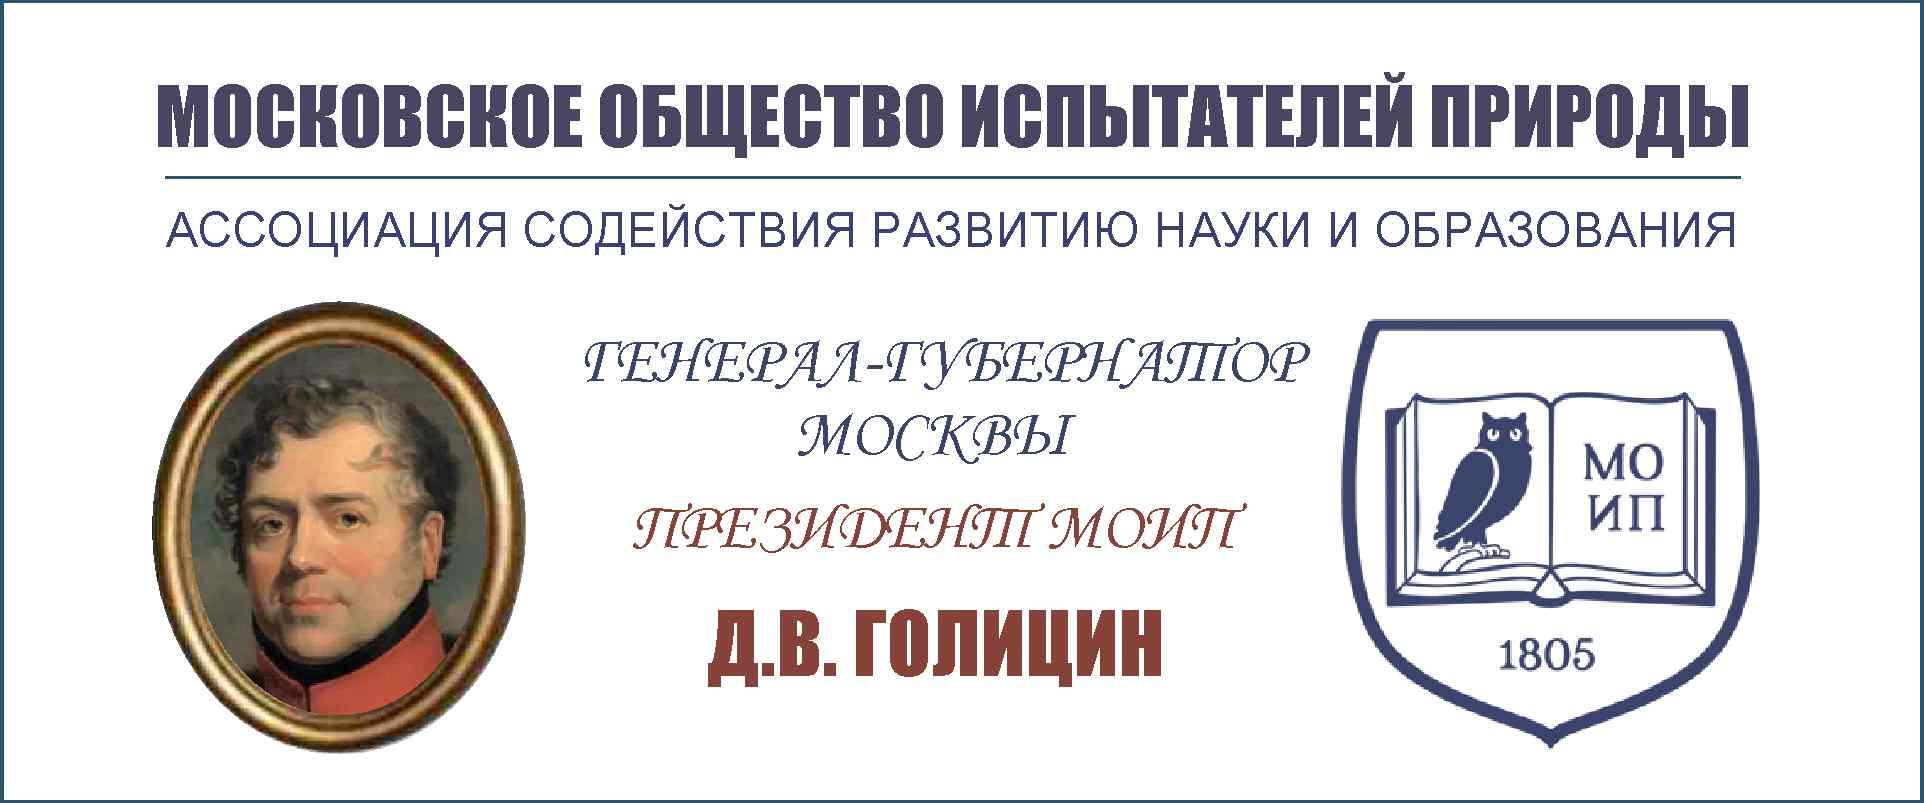 ГЕНЕРАЛ-ГУБЕРНАТОР МОСКВЫ – ПРЕЗИДЕНТ МОИП